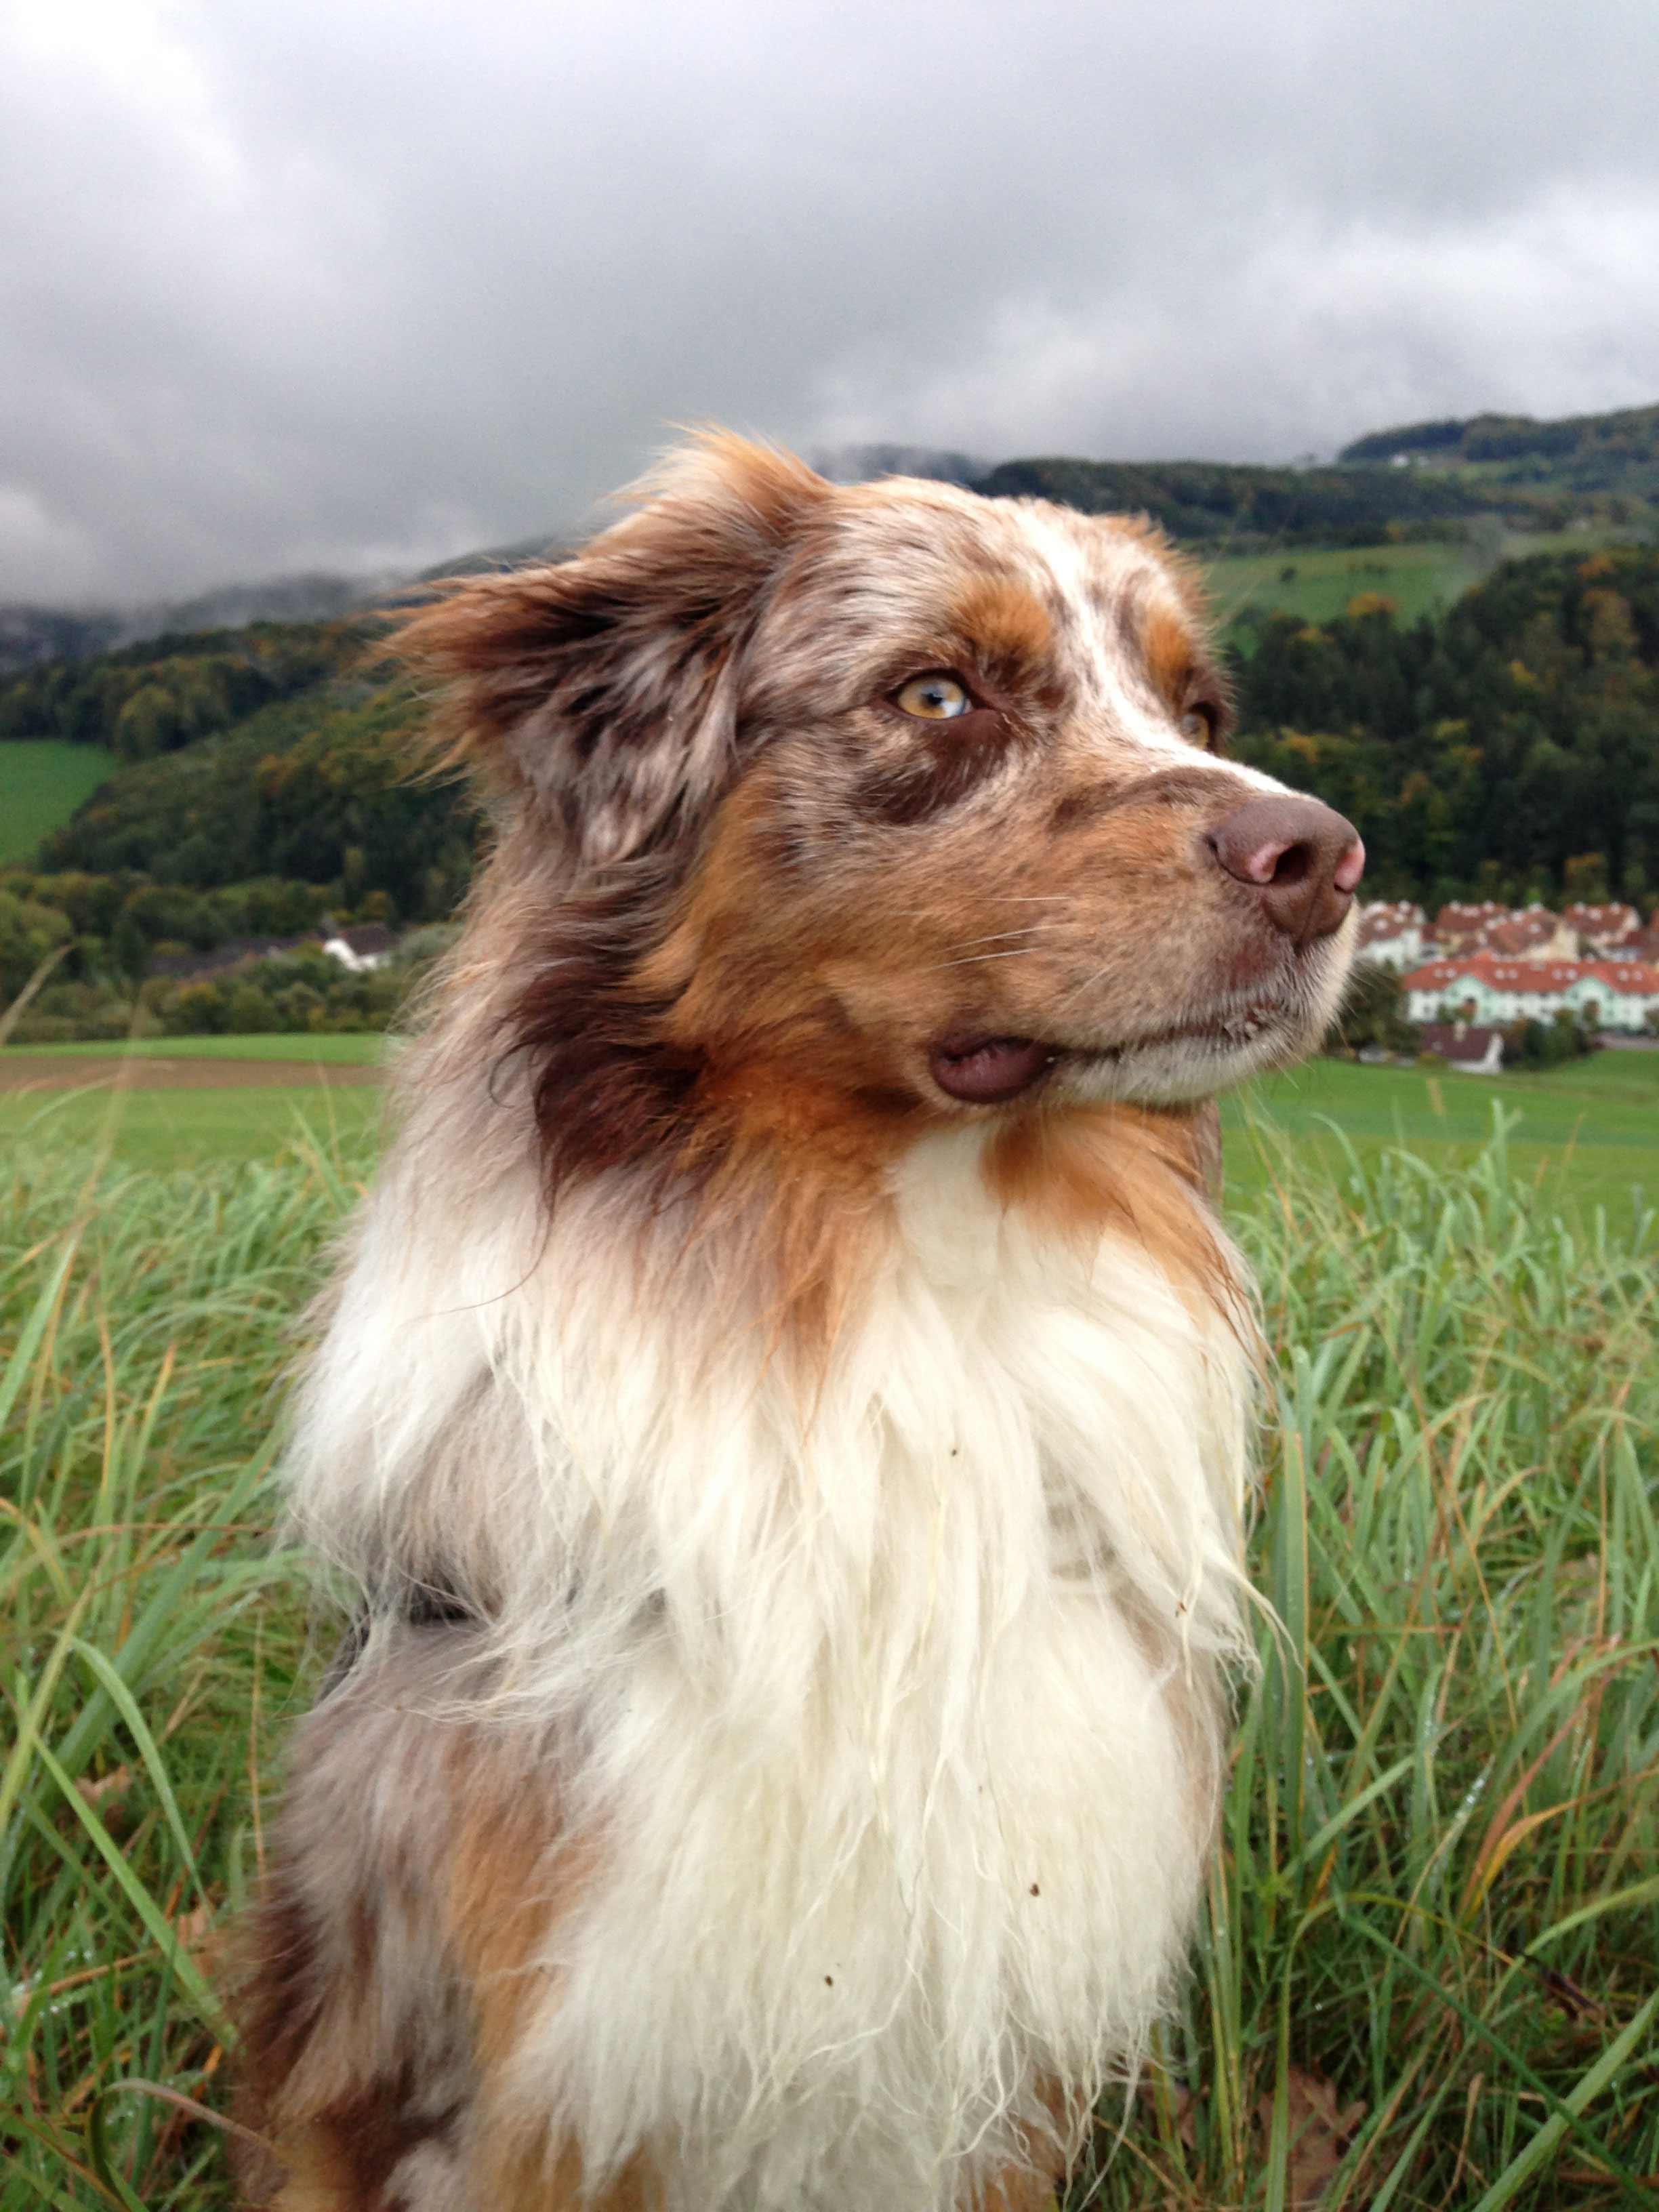 The Australian Women S Weekly The Best Of Disney Kid S: Australian Shepherd Dog Breed » Information, Pictures, & More